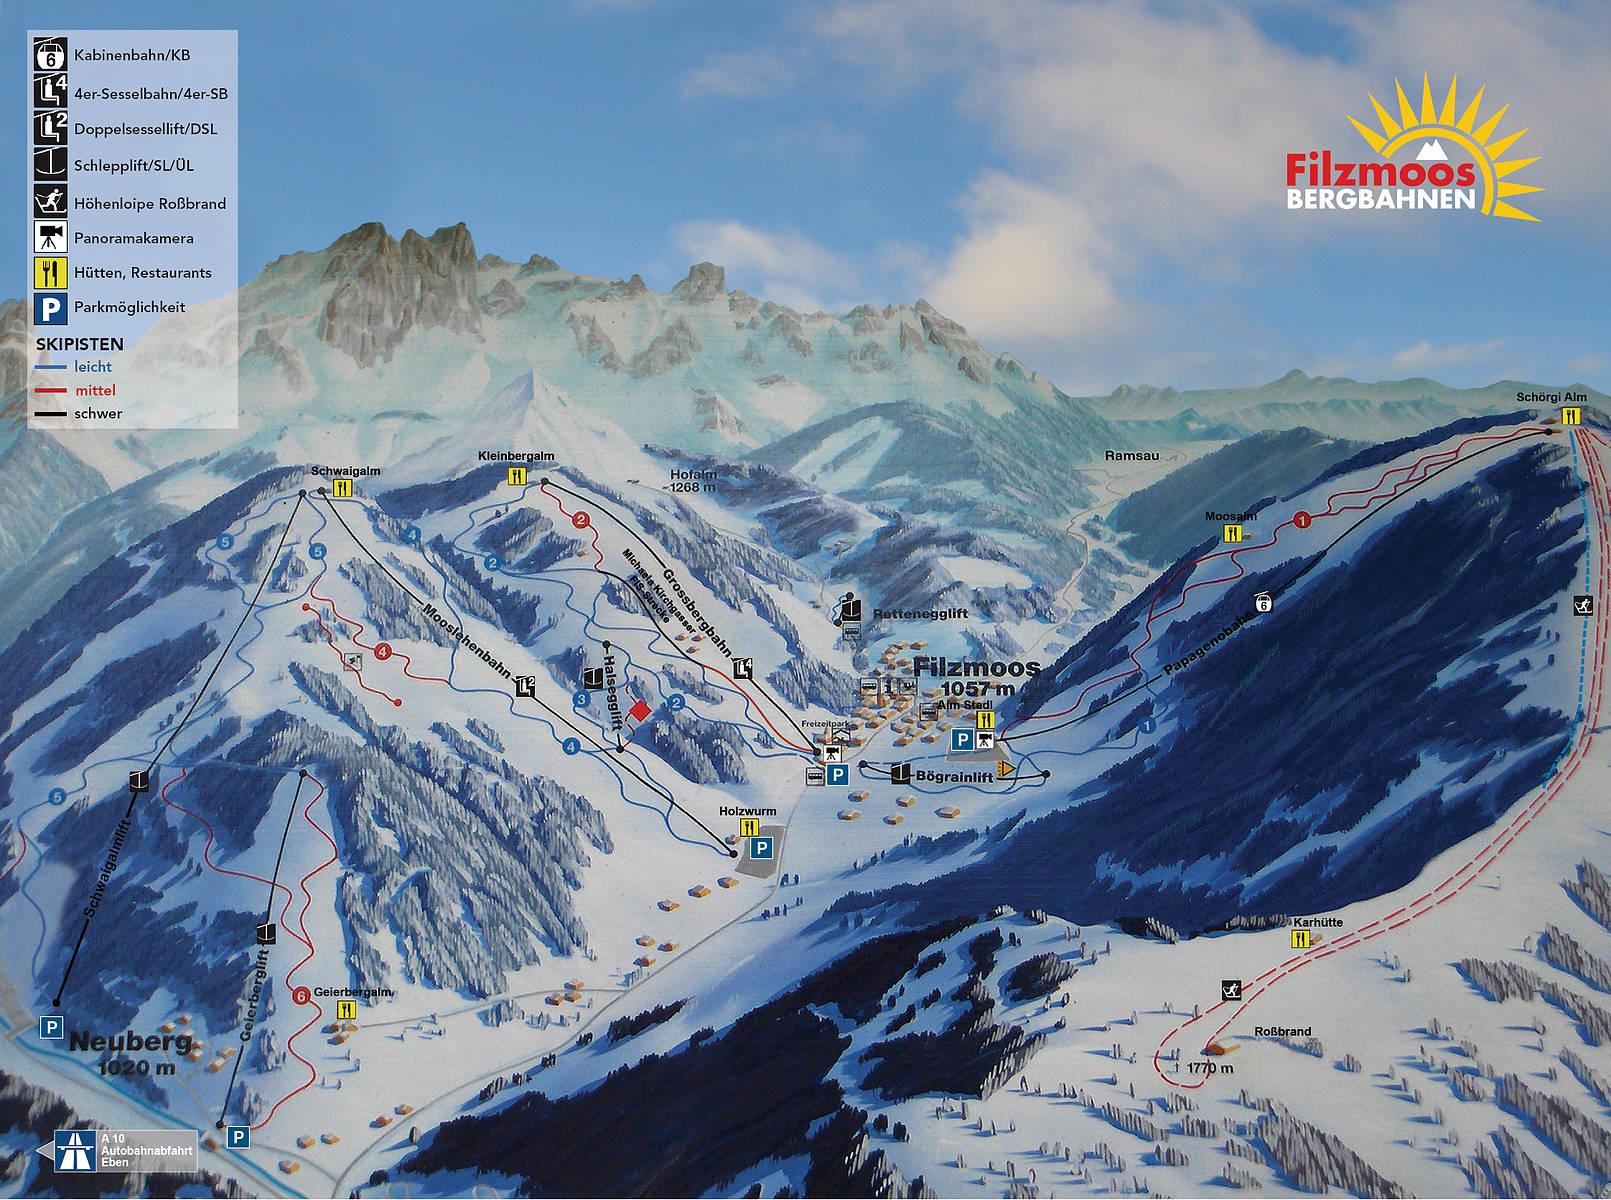 Filzmoos - Ski amade